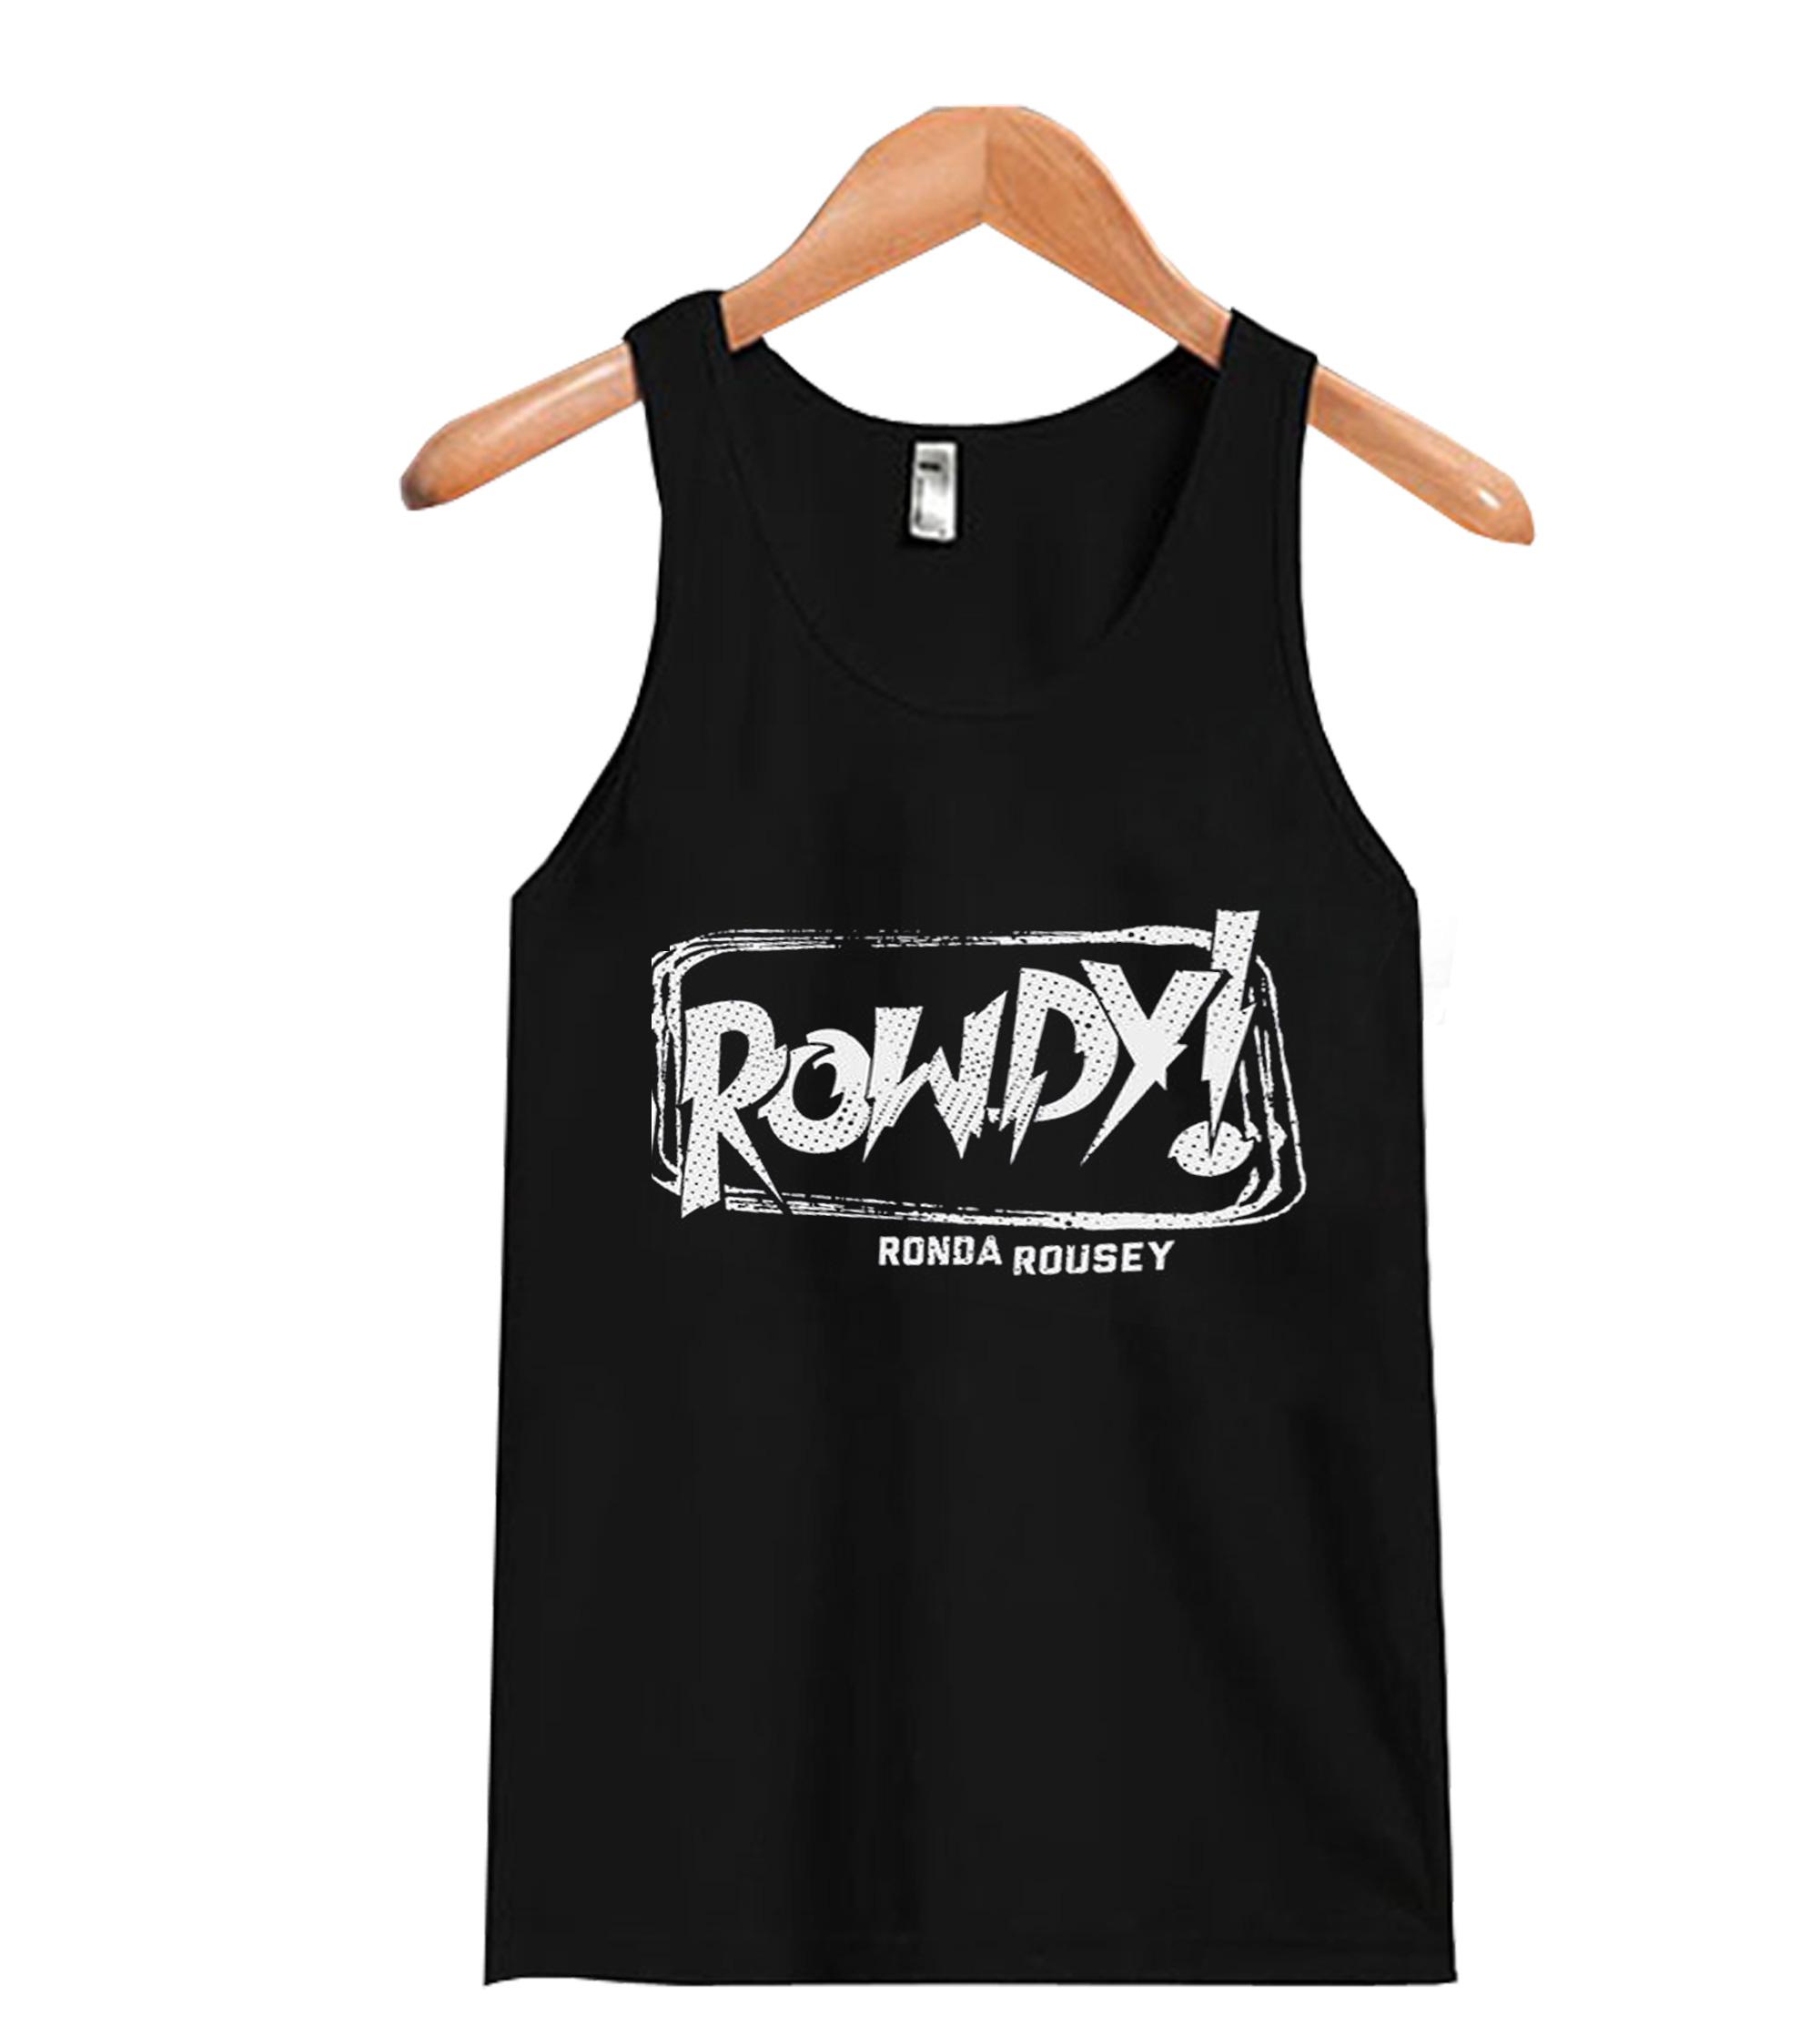 Rowdy Ronda Rouse Tanktop